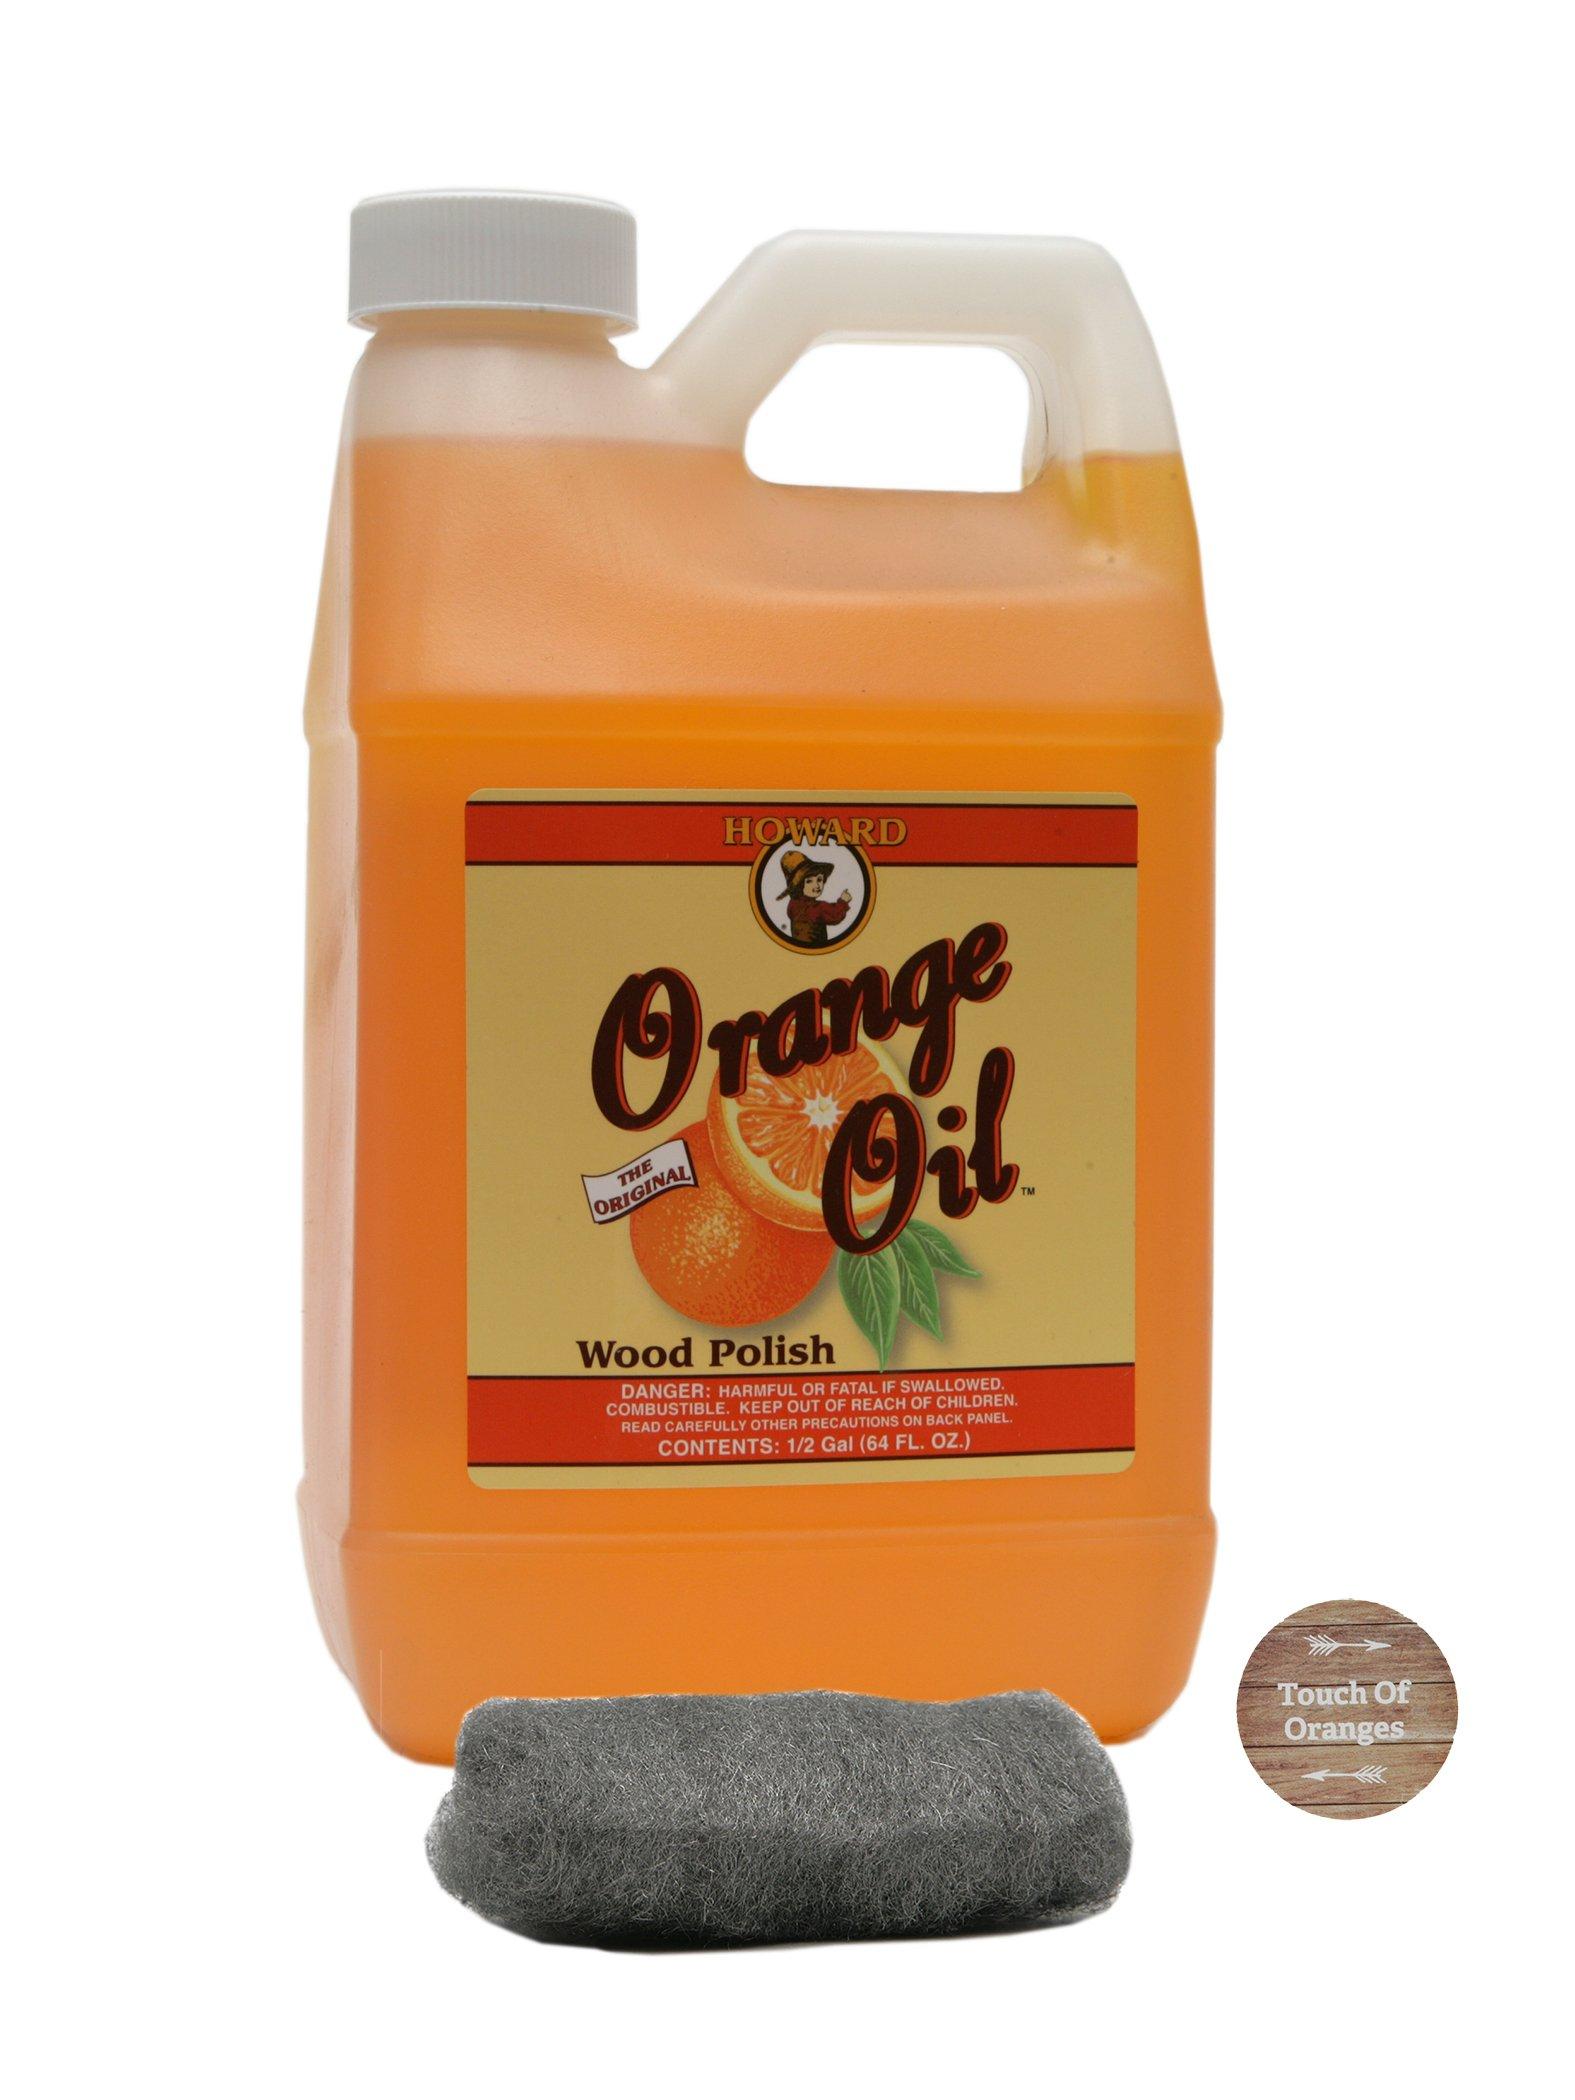 Howard Orange Oil 64 oz Half Gallon, Clean Kitchen Cabinets, Polish and Shine Wood Furniture, Orange Wood Cleaner